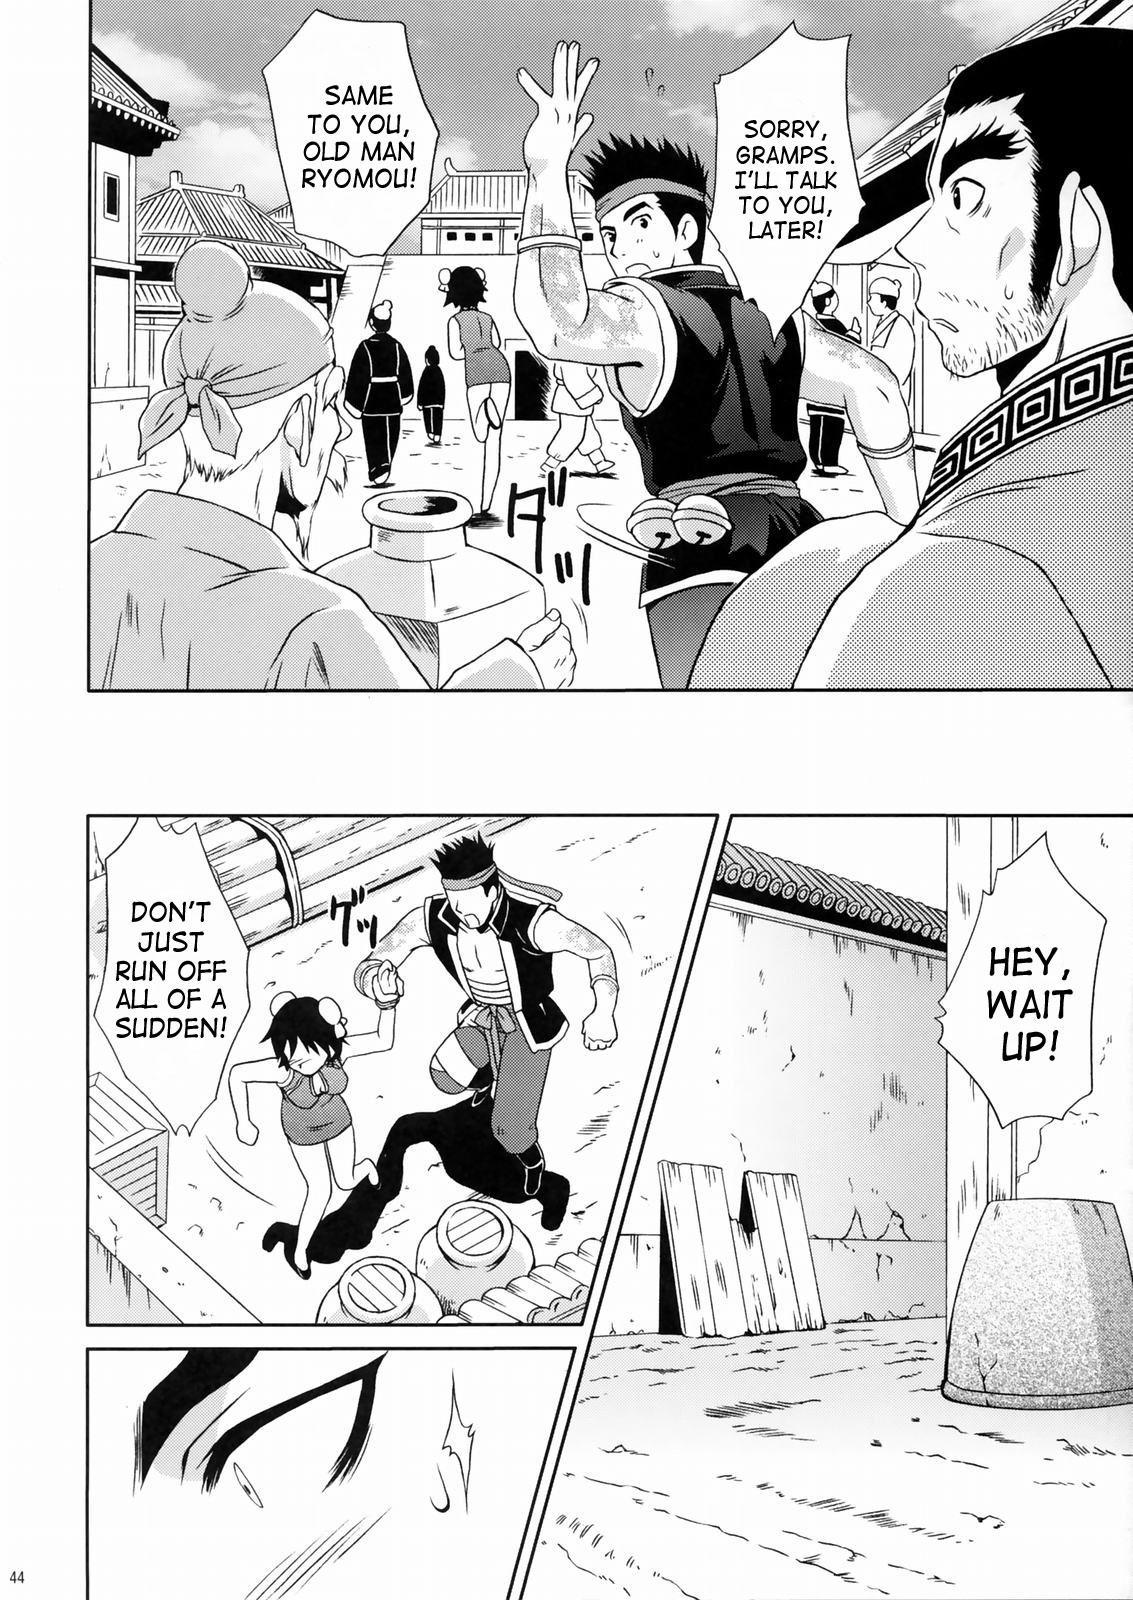 (C66) [U.R.C (Momoya Show-Neko)] Rikuson-chan ~Lovely Gunshi no Himitsu~ | Rikuson-chan Secret of The Lovely Strategist (Dynasty Warriors) [English] [SaHa] 42